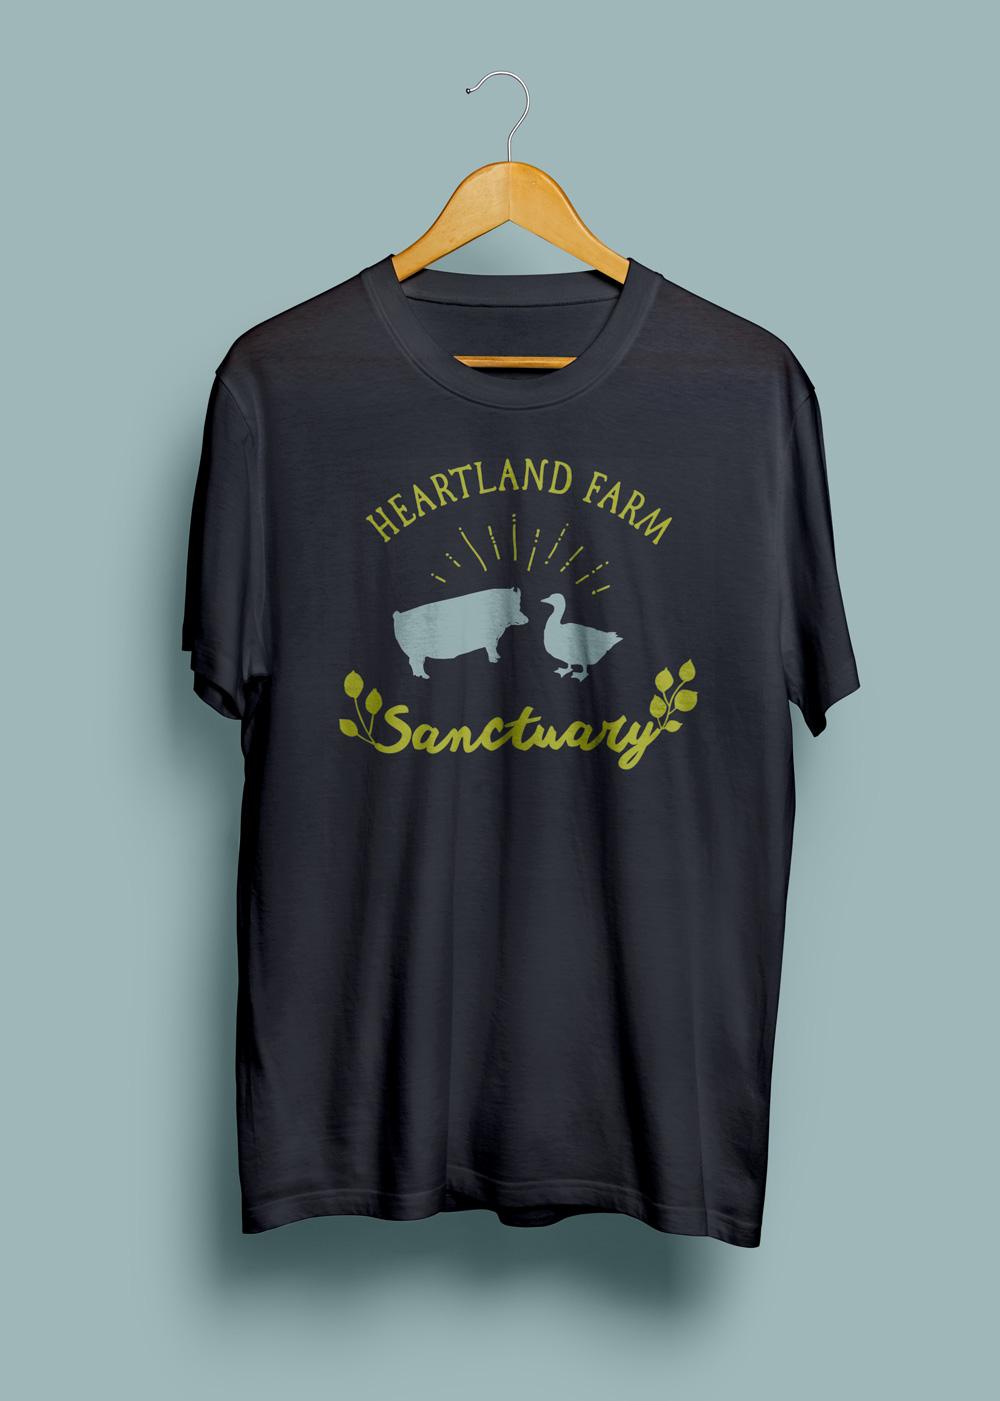 Heartland_color_tshirt.jpg